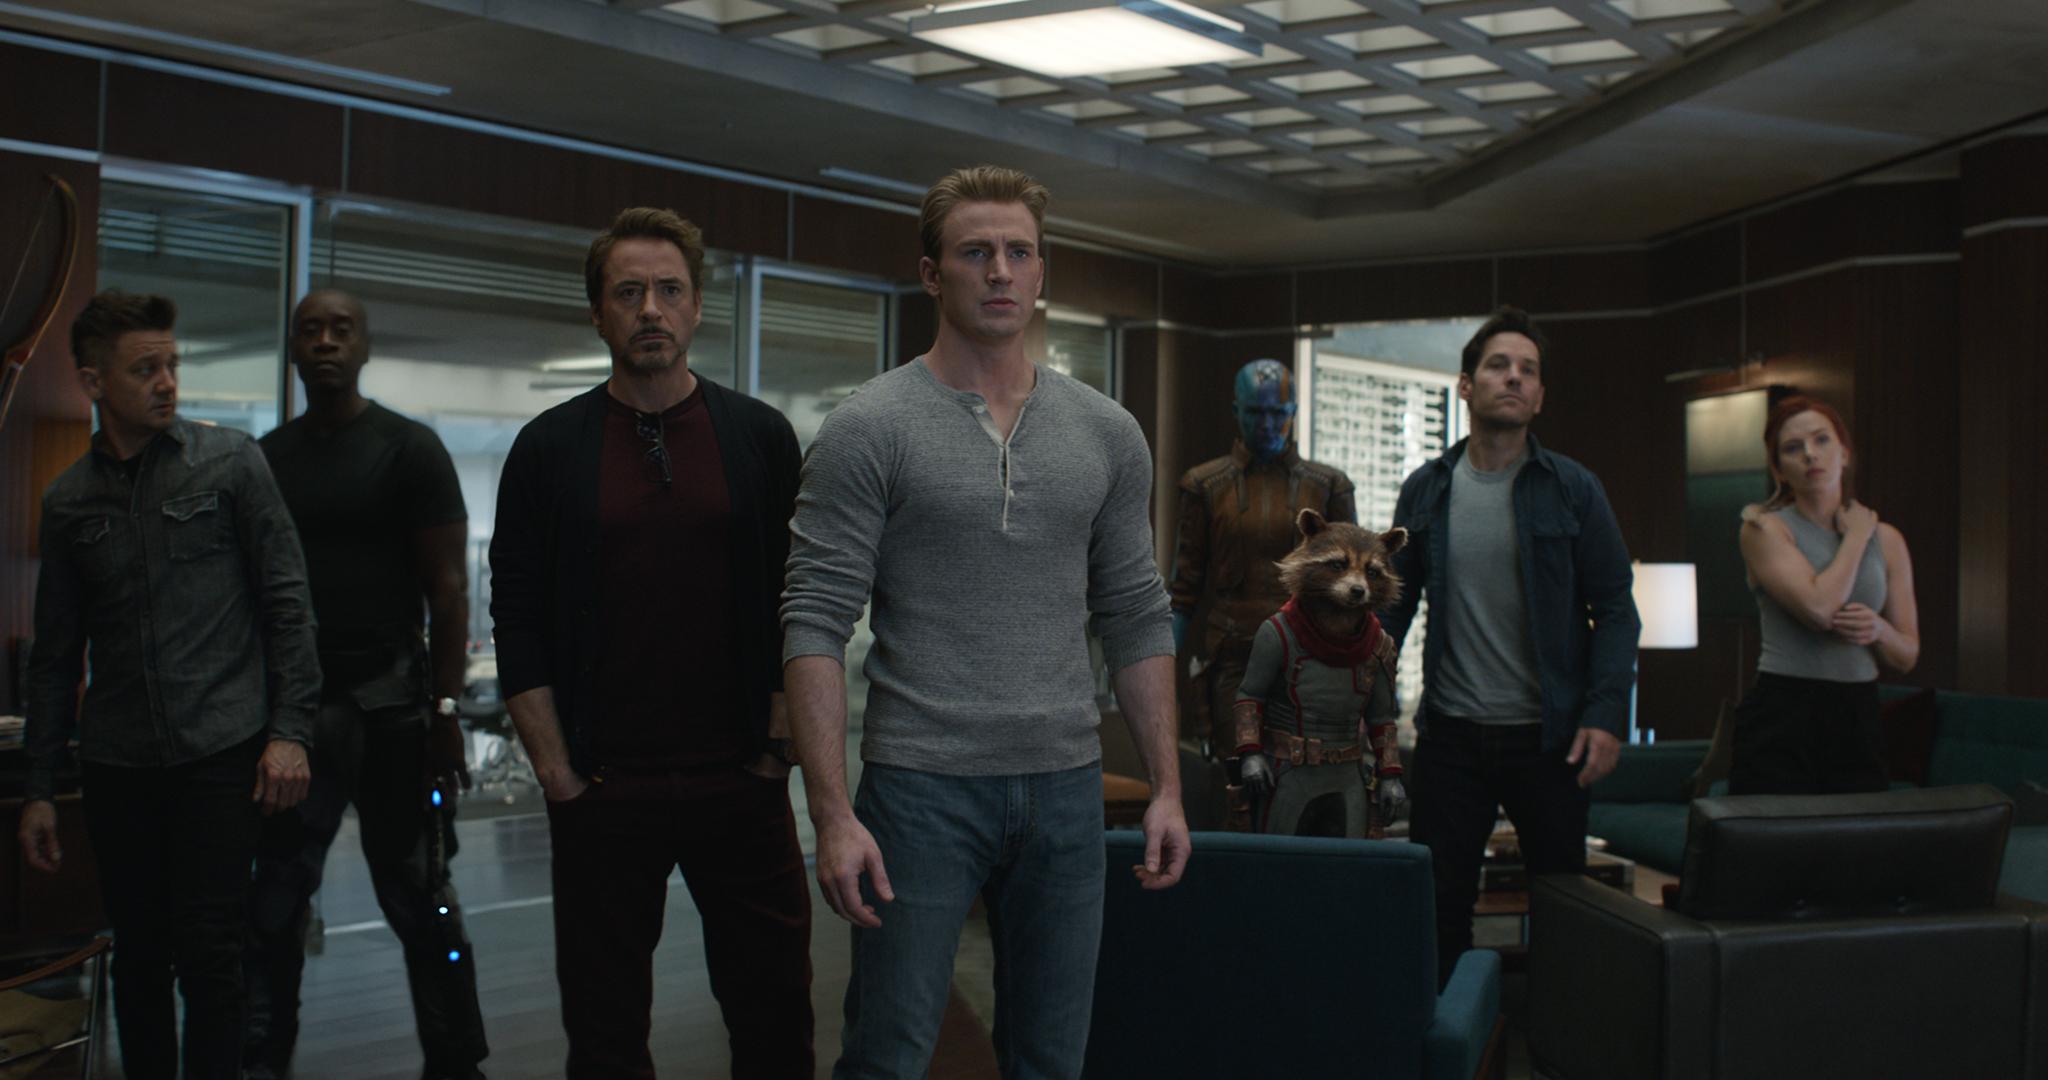 Avengers: Endgame's' top 5 geekiest moments - The Washington ... on thor beautiful planet, superman's home planet, spock's home planet, thor's home city, thor's home asgard, cartoon thor home planet,